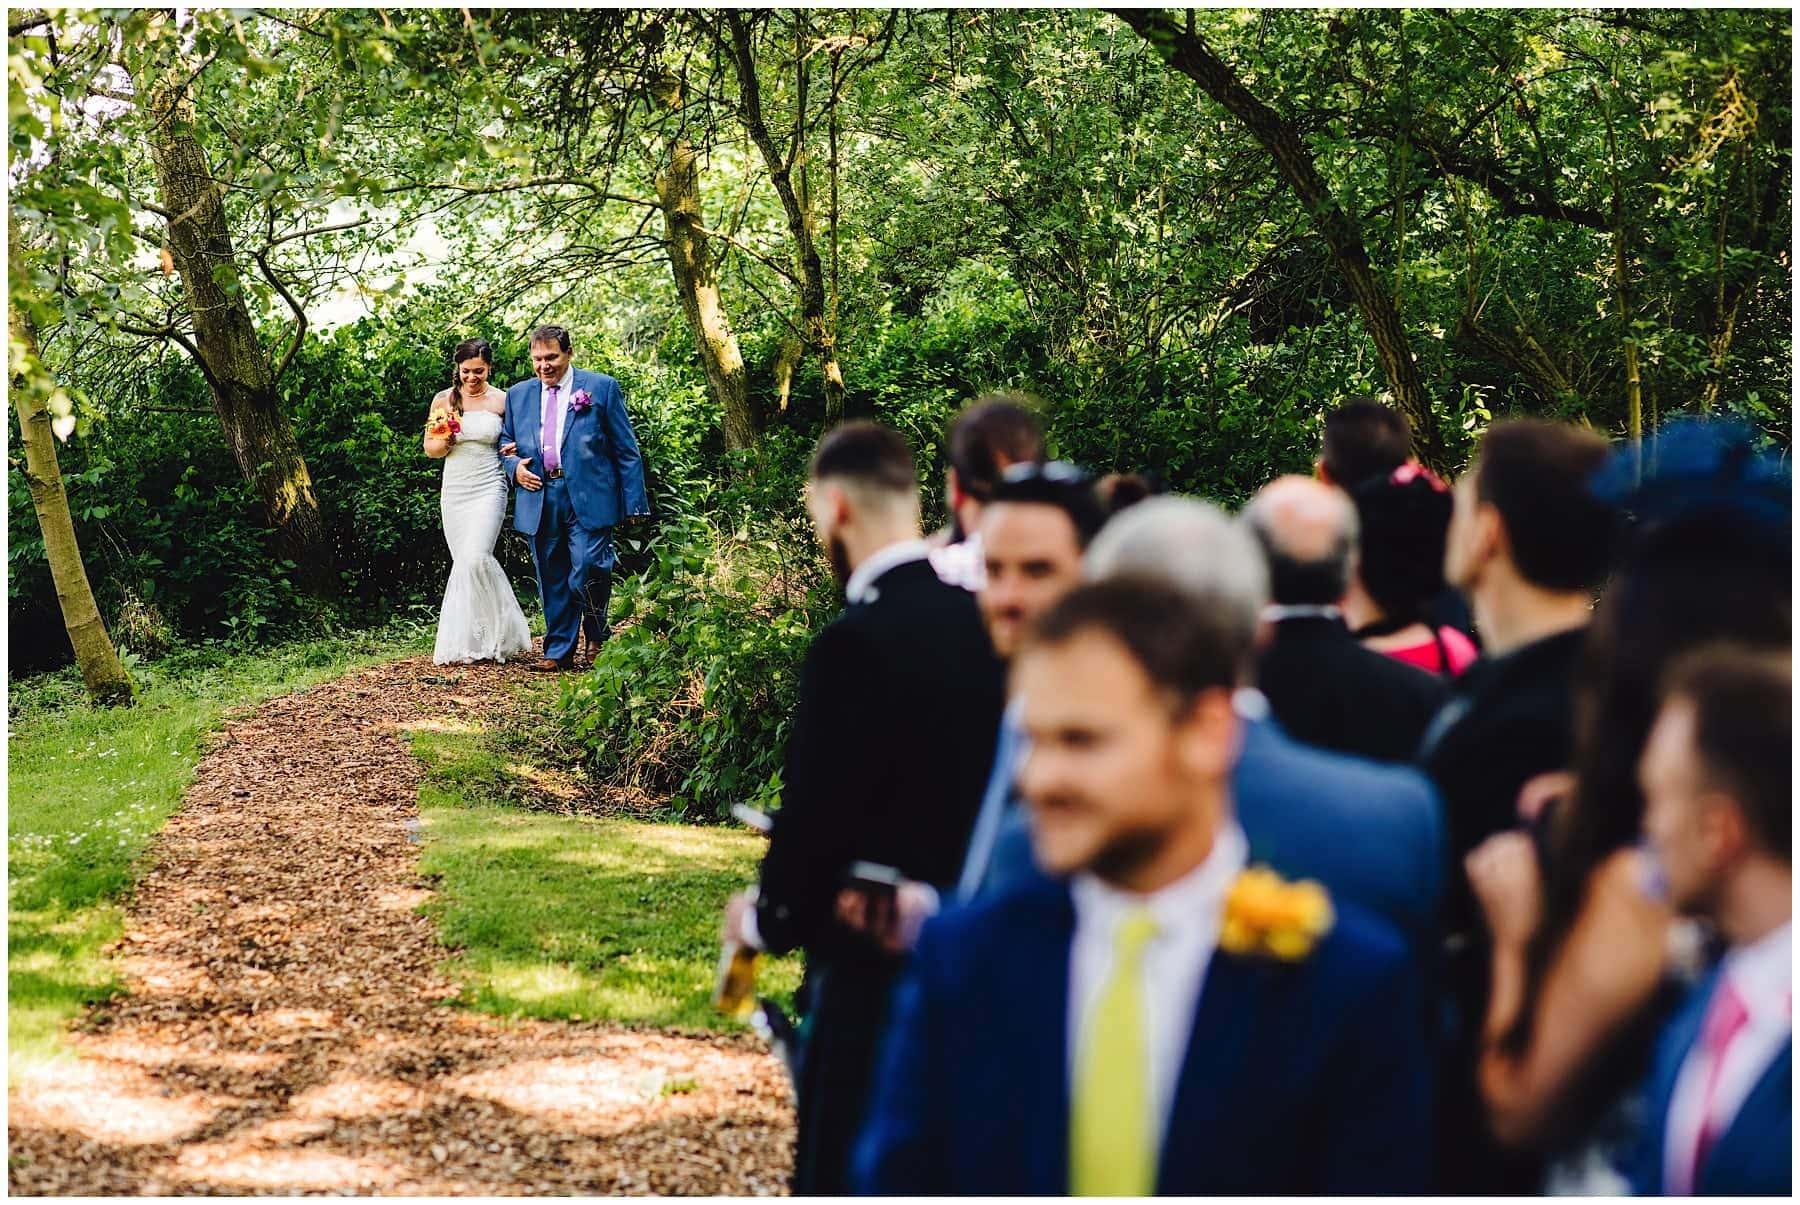 Hothorp Hall Woodlands Wedding Photographer 16